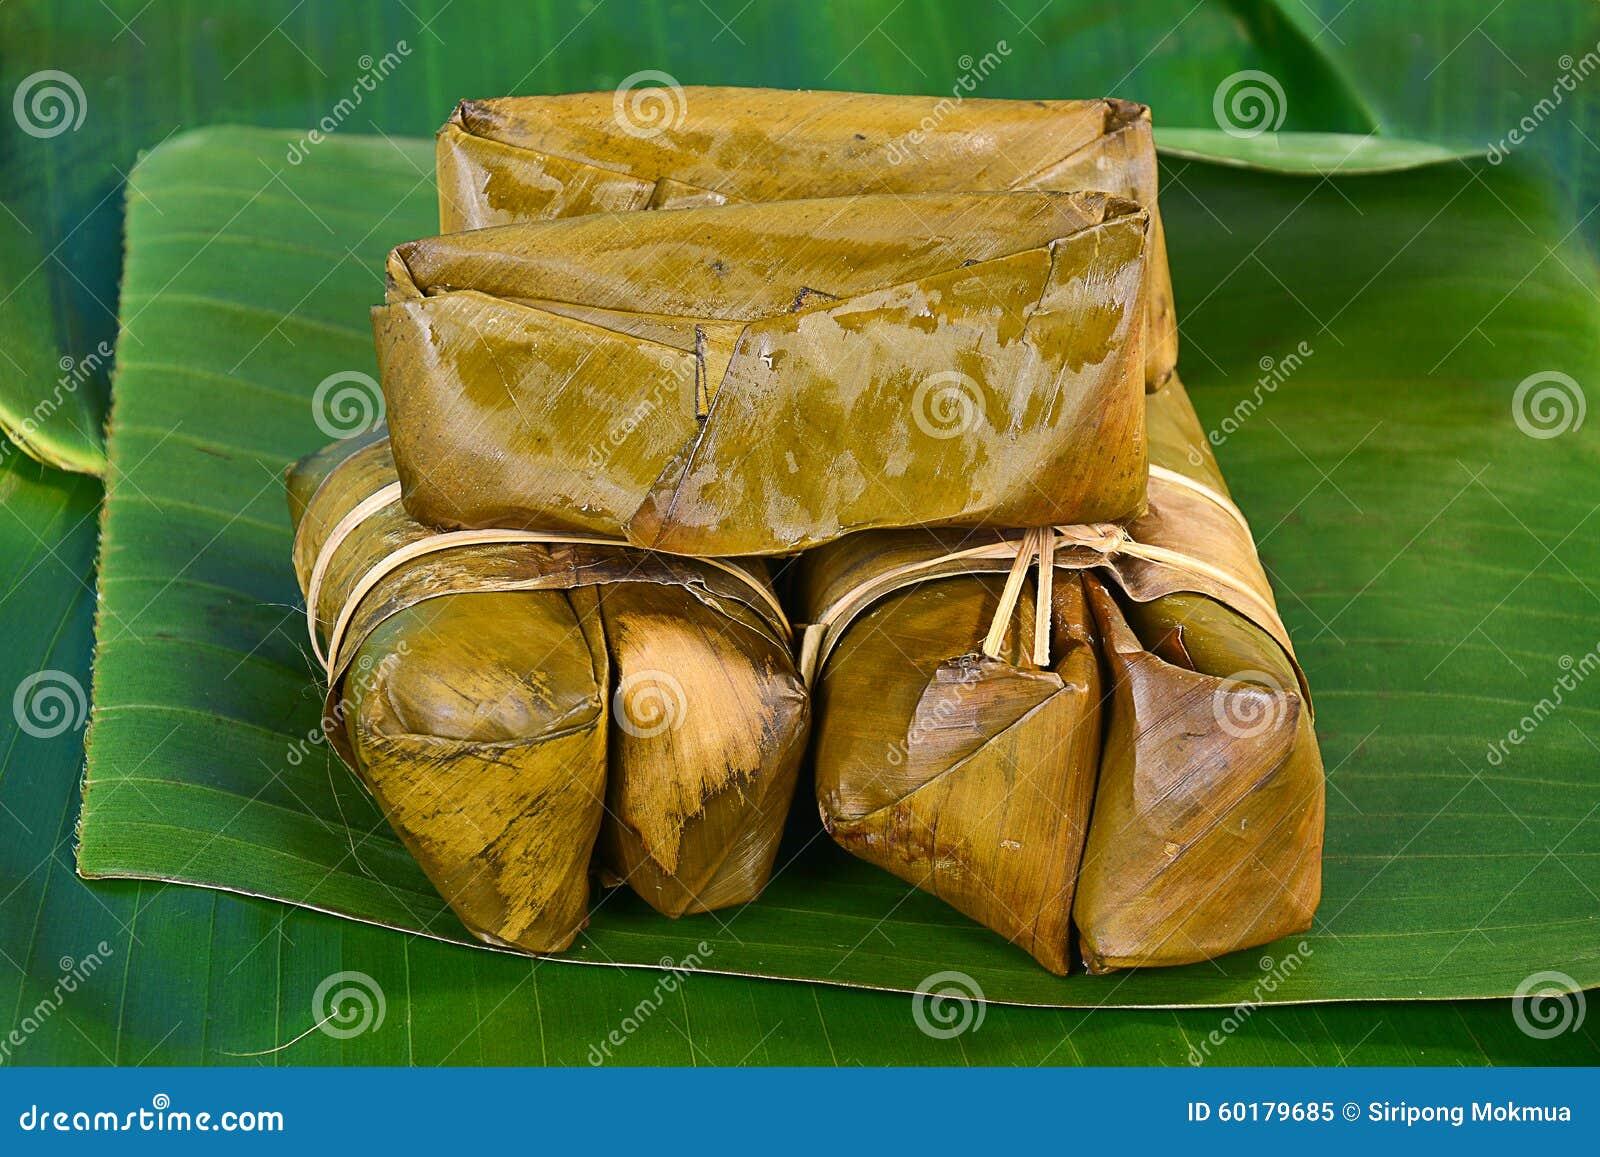 Thai sweets bunch of mush on banana leaf